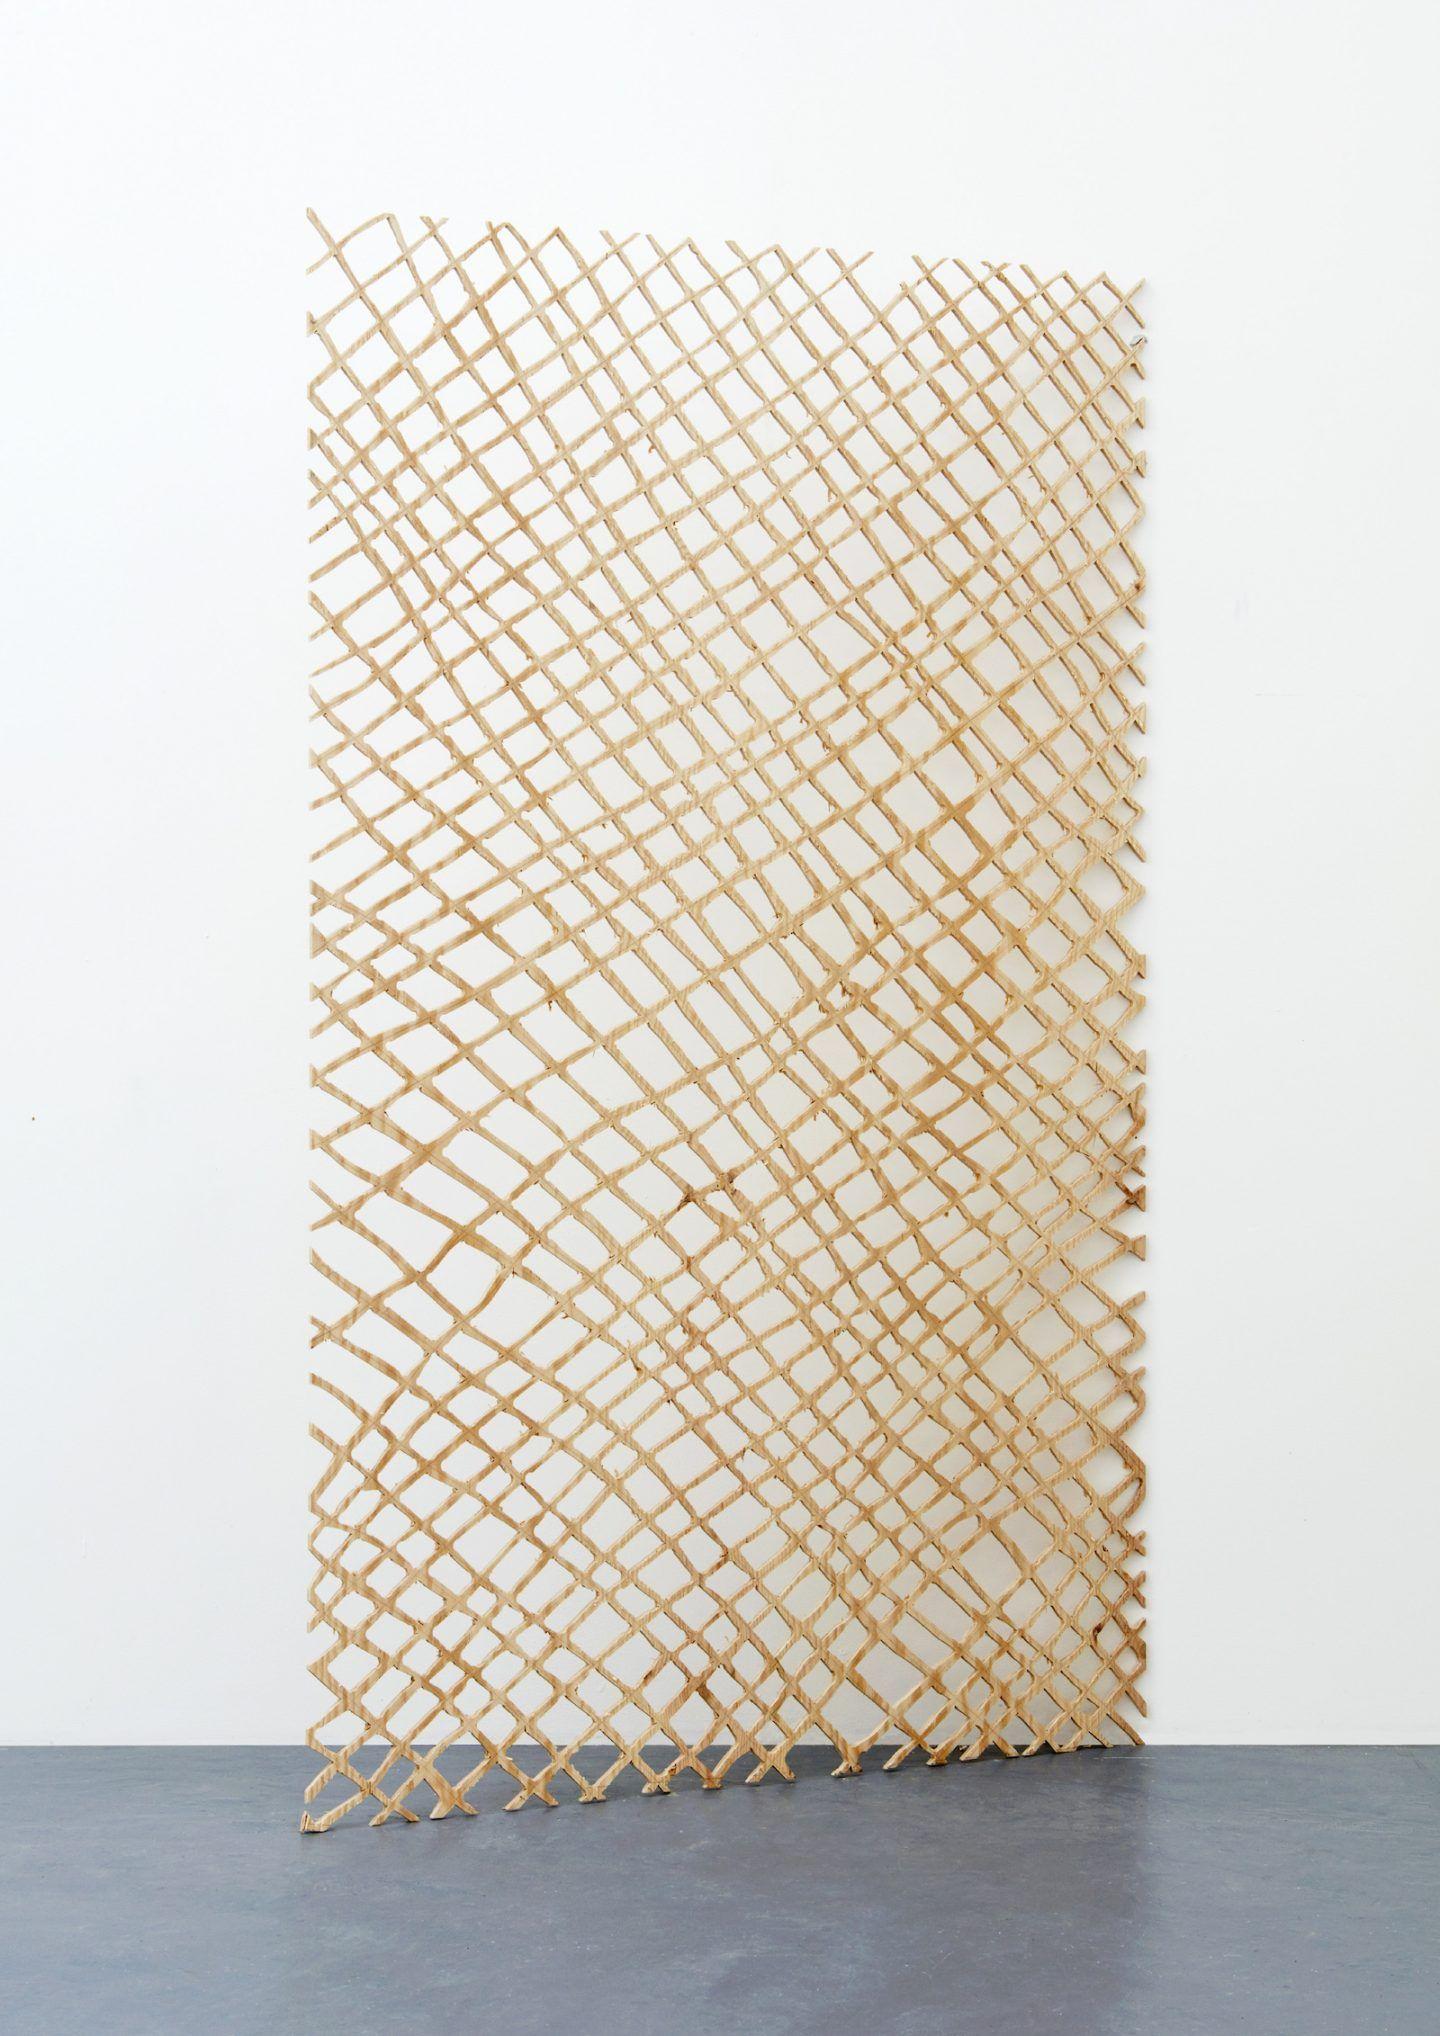 IGNANT-Art-Valentin-Abad-008